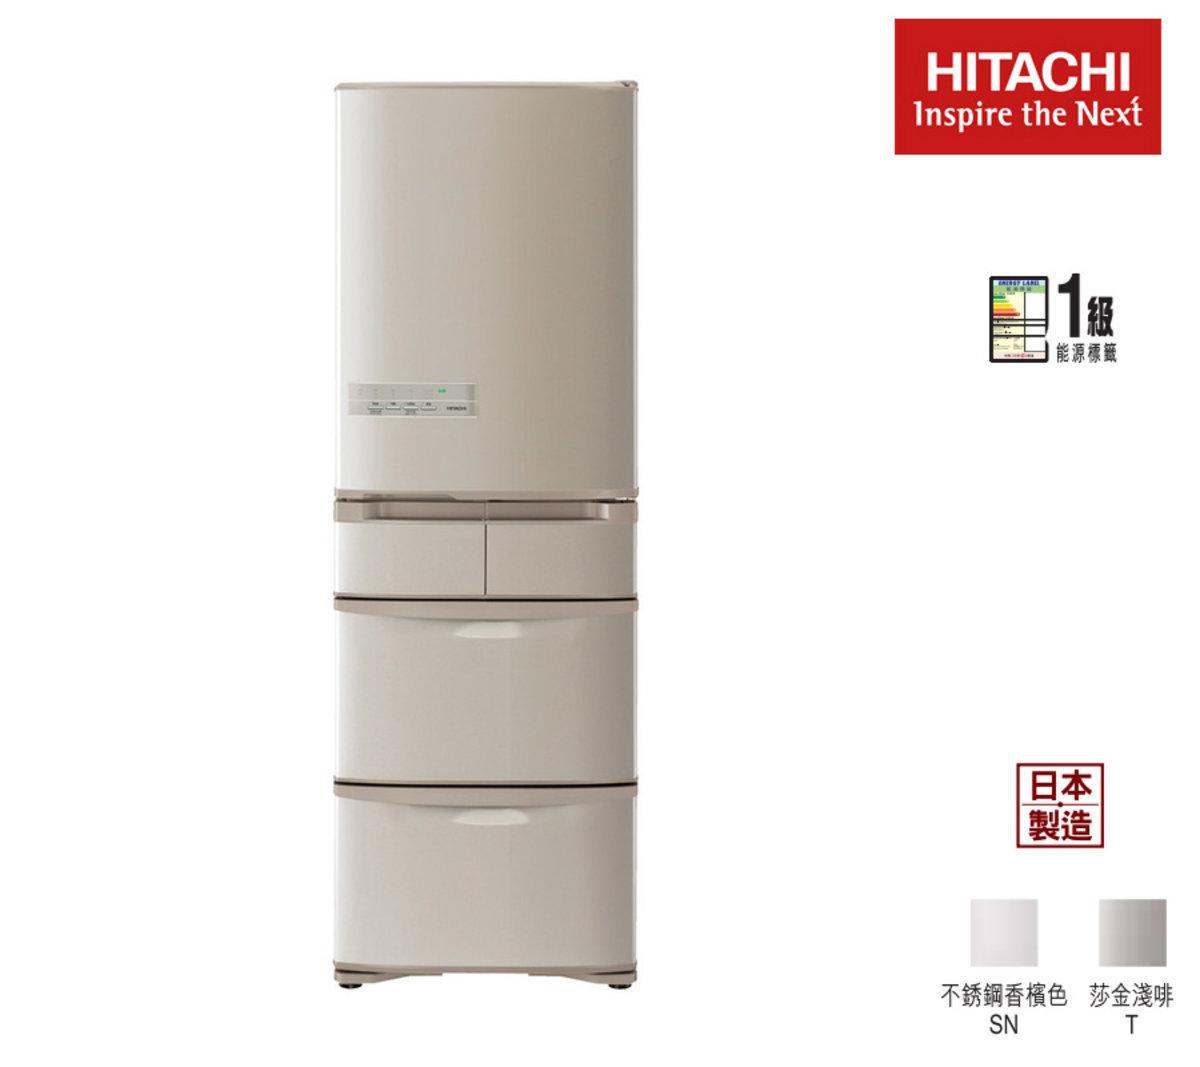 Mulri-Door Refrigerator 360L (Strainless Champangne) R-SF48GHSN